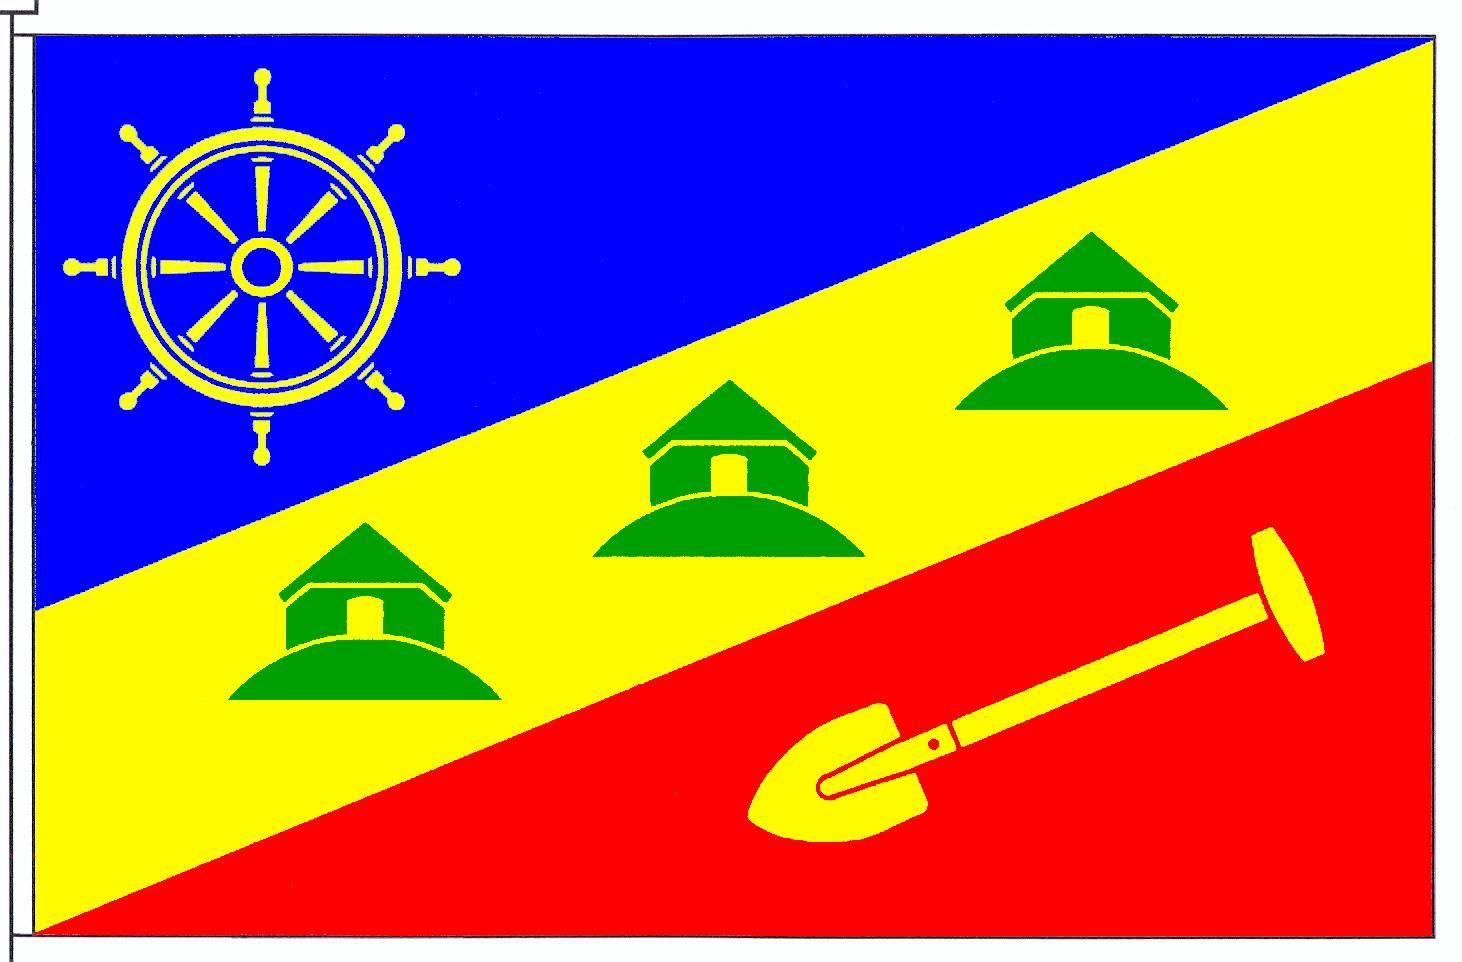 Flagge GemeindeDagebüll, Kreis Nordfriesland